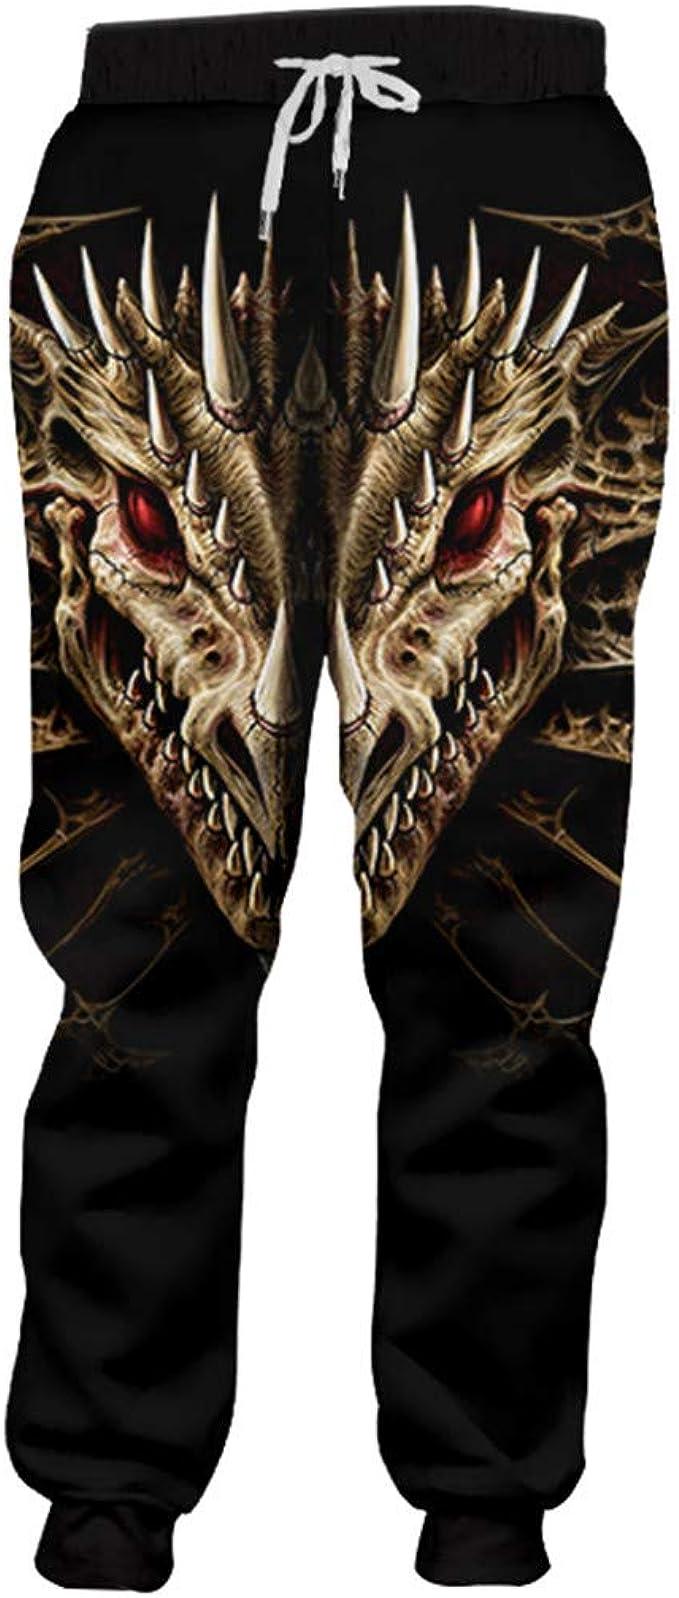 Pantalones de chándal Ocasionales de los Hombres Imprimir ...